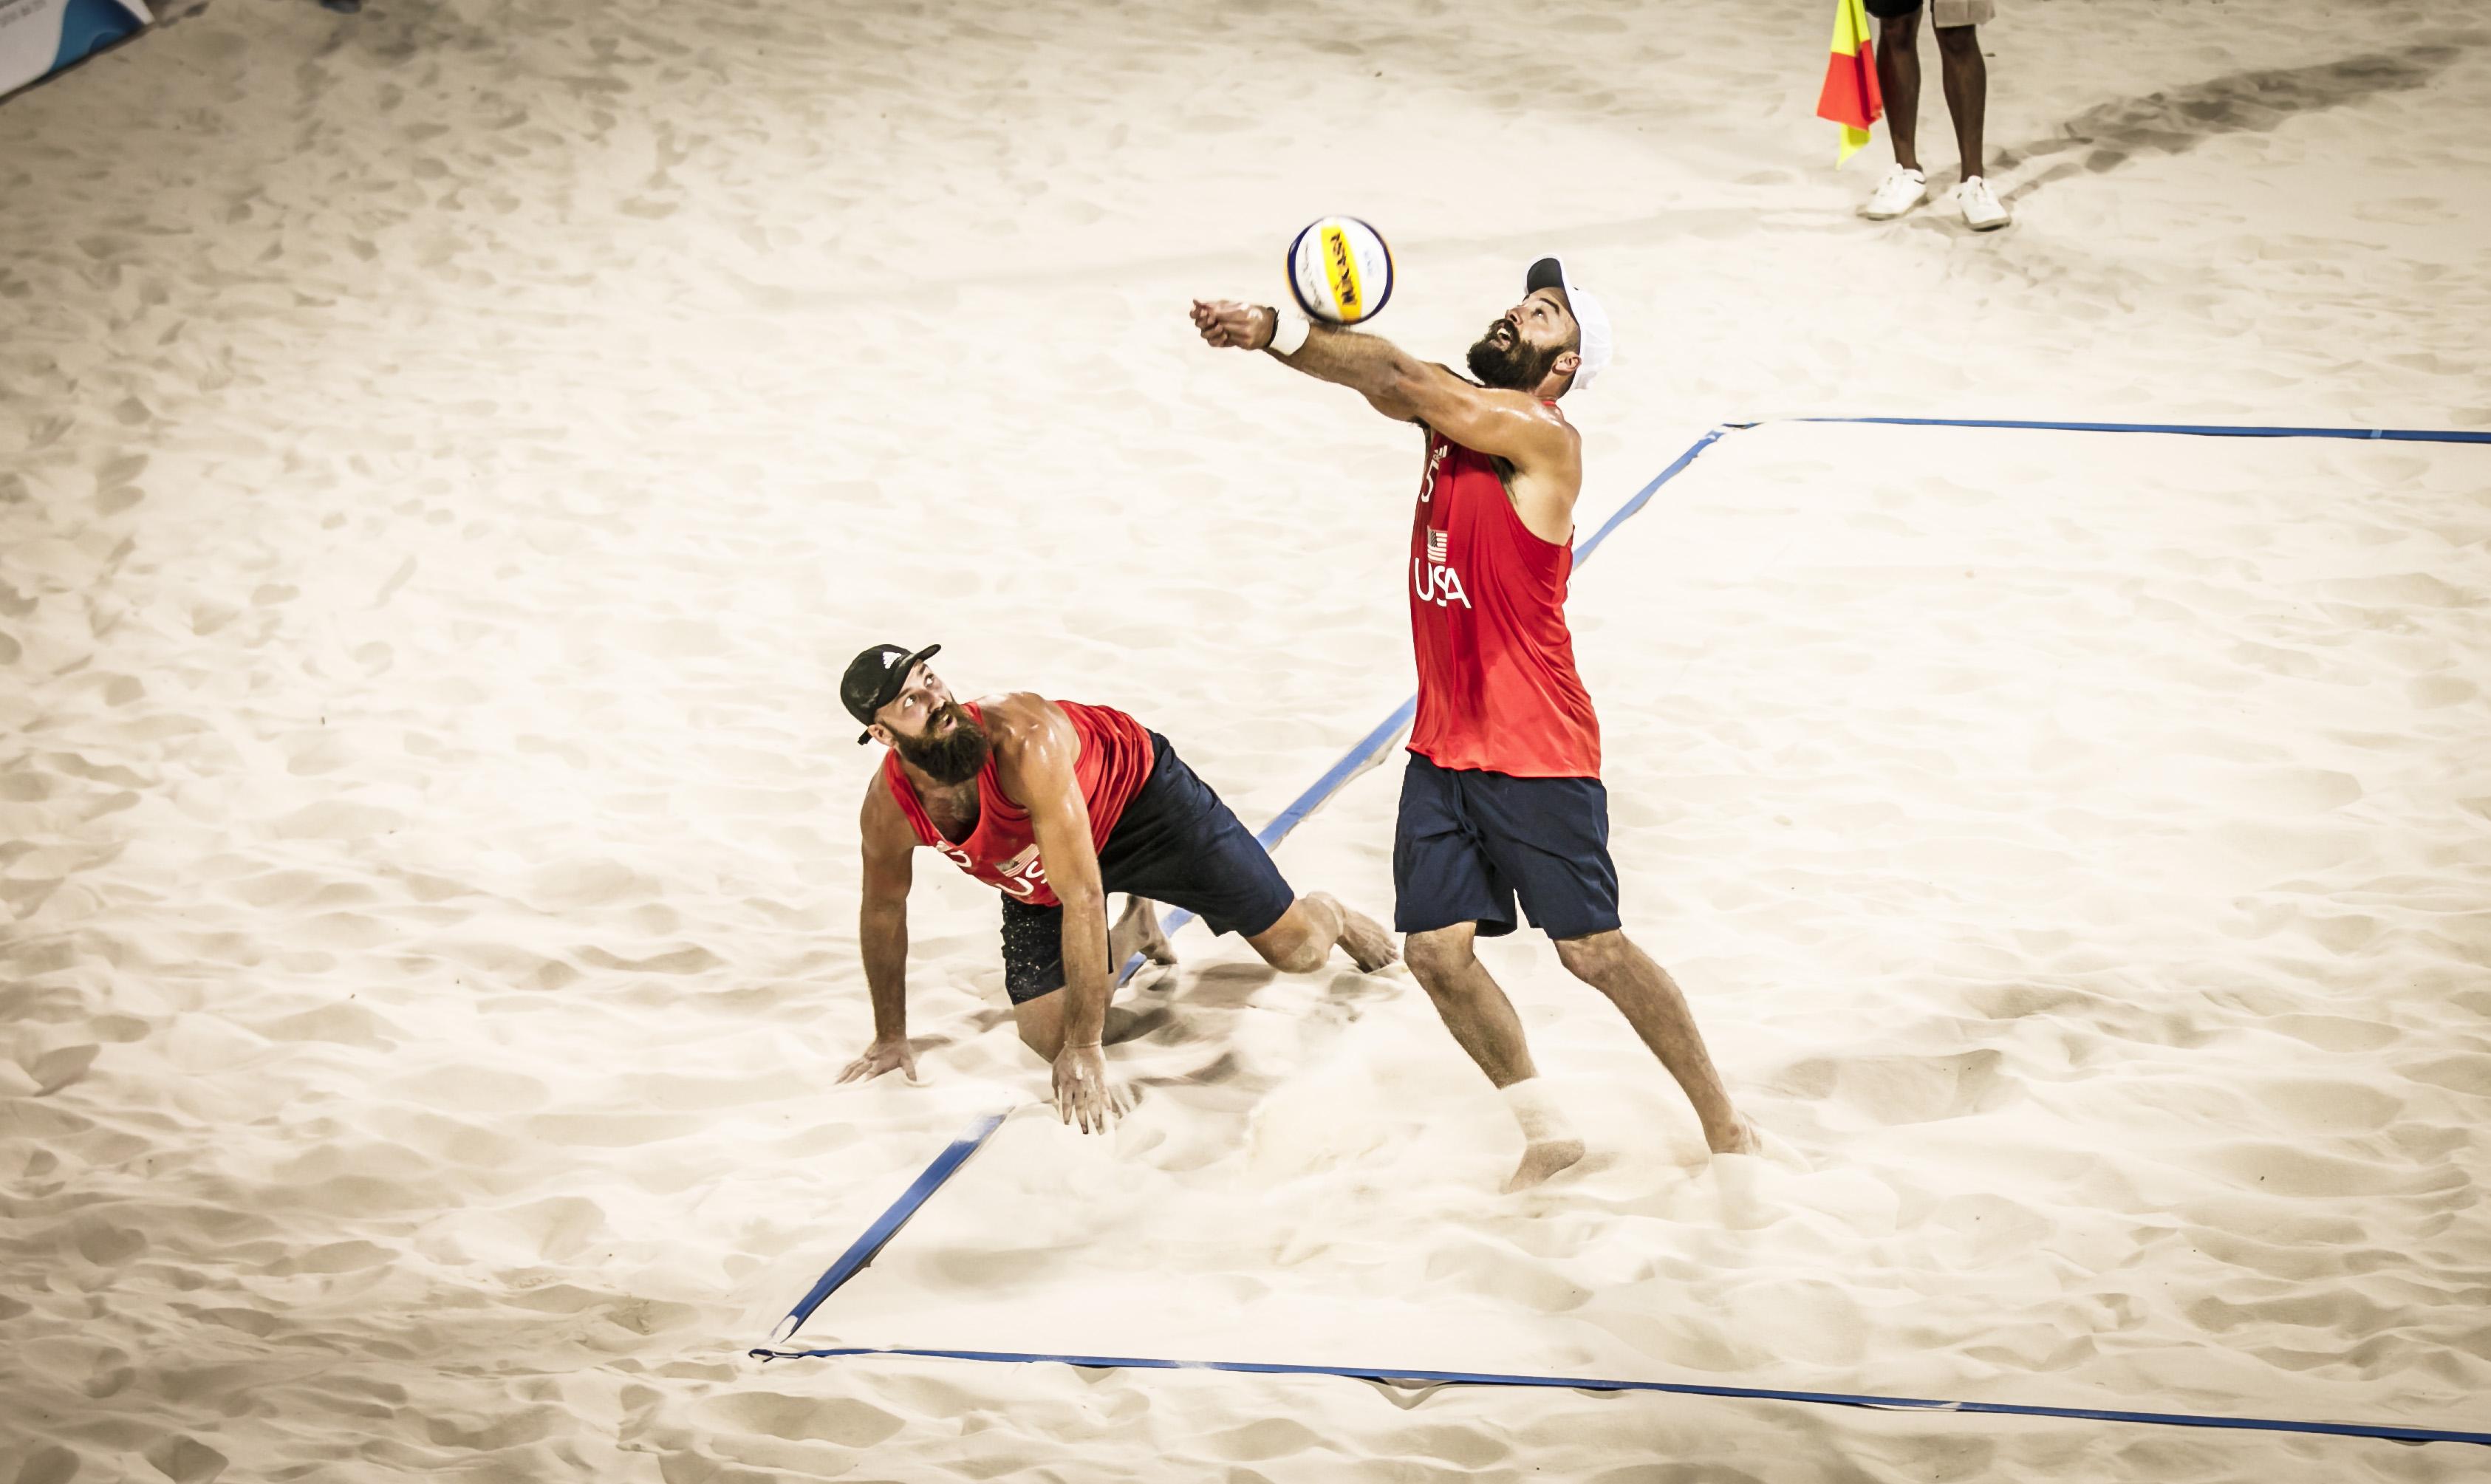 News - Qatar v USA in men's 4x4 final at World Beach Games